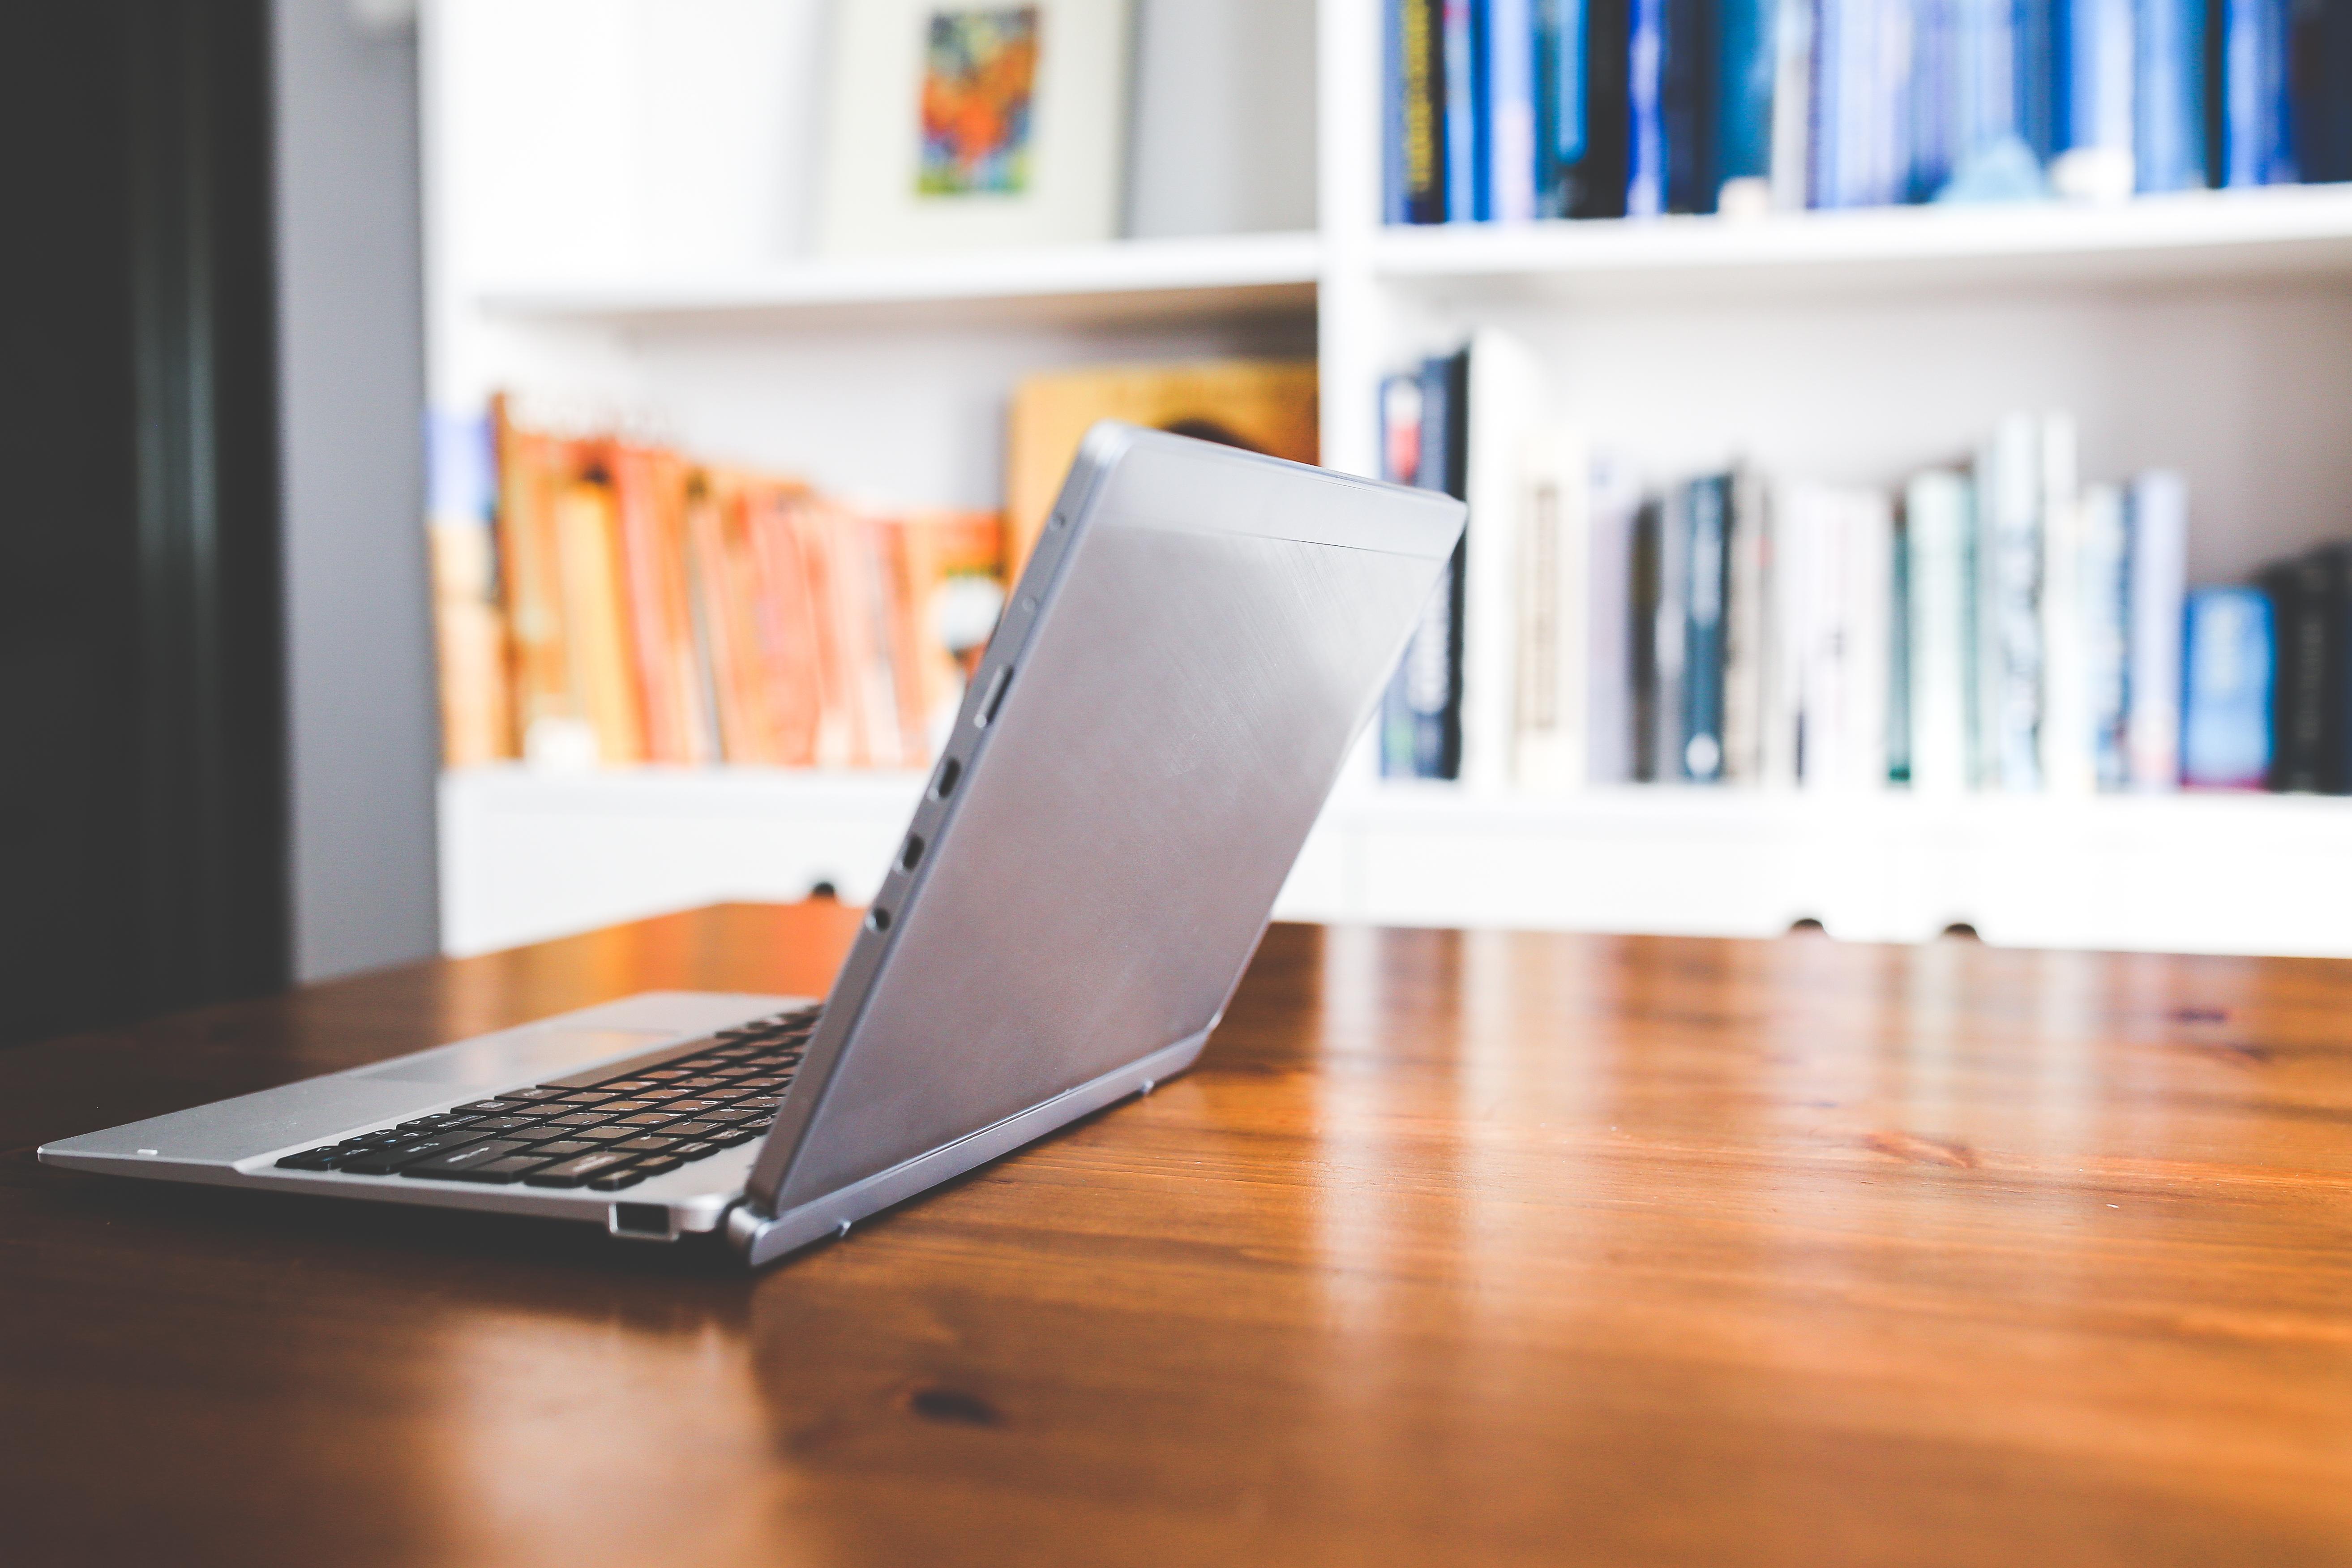 Laptop Desk Computer Table Technology Floor Home Office Shelf Furniture Room Interior Design